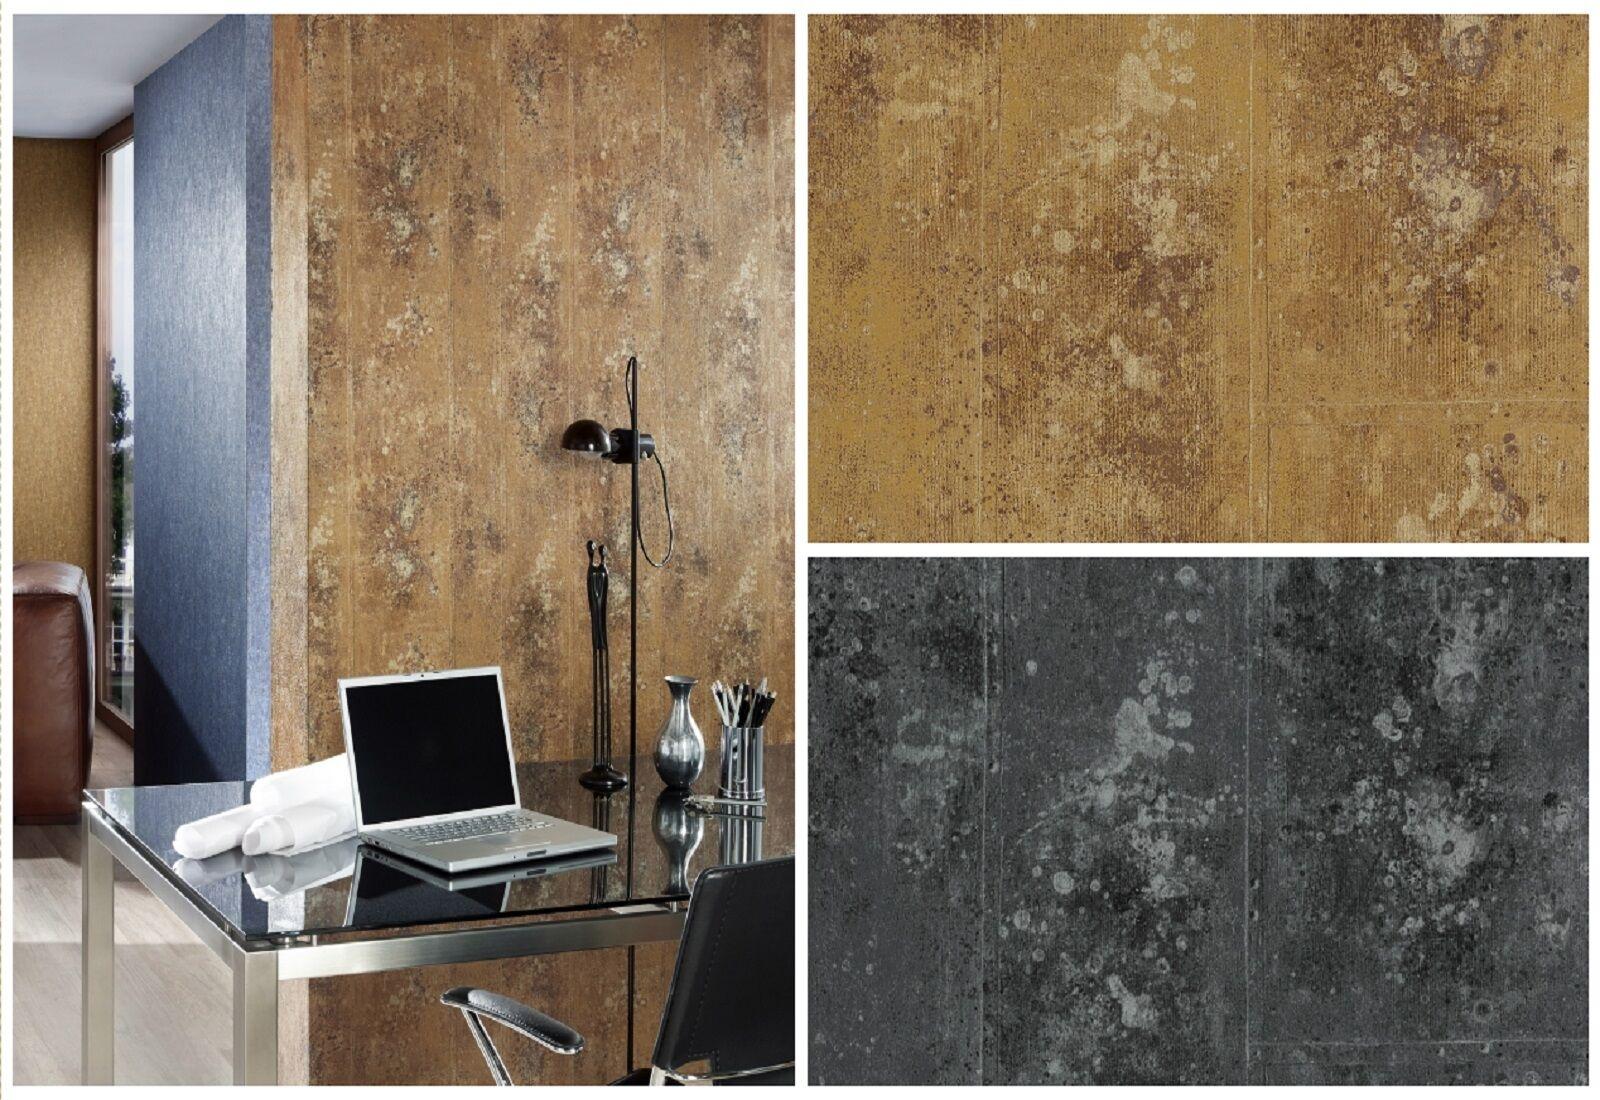 vlies tapete beton optik stein wand gold braun anthrazit. Black Bedroom Furniture Sets. Home Design Ideas